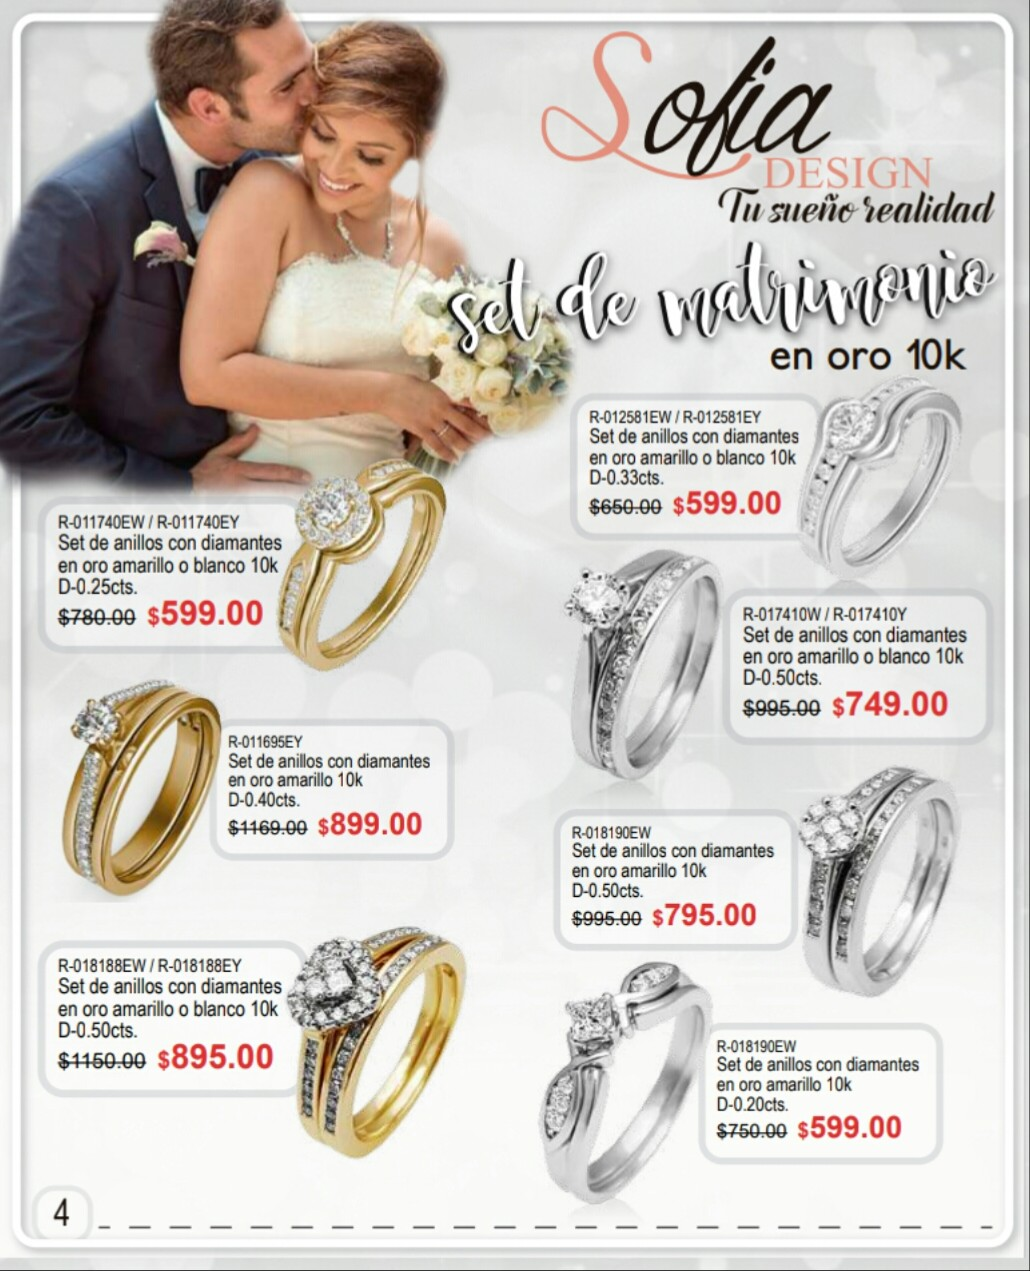 Catalogo de prendas DG Joyeros Agosto 2019 p4